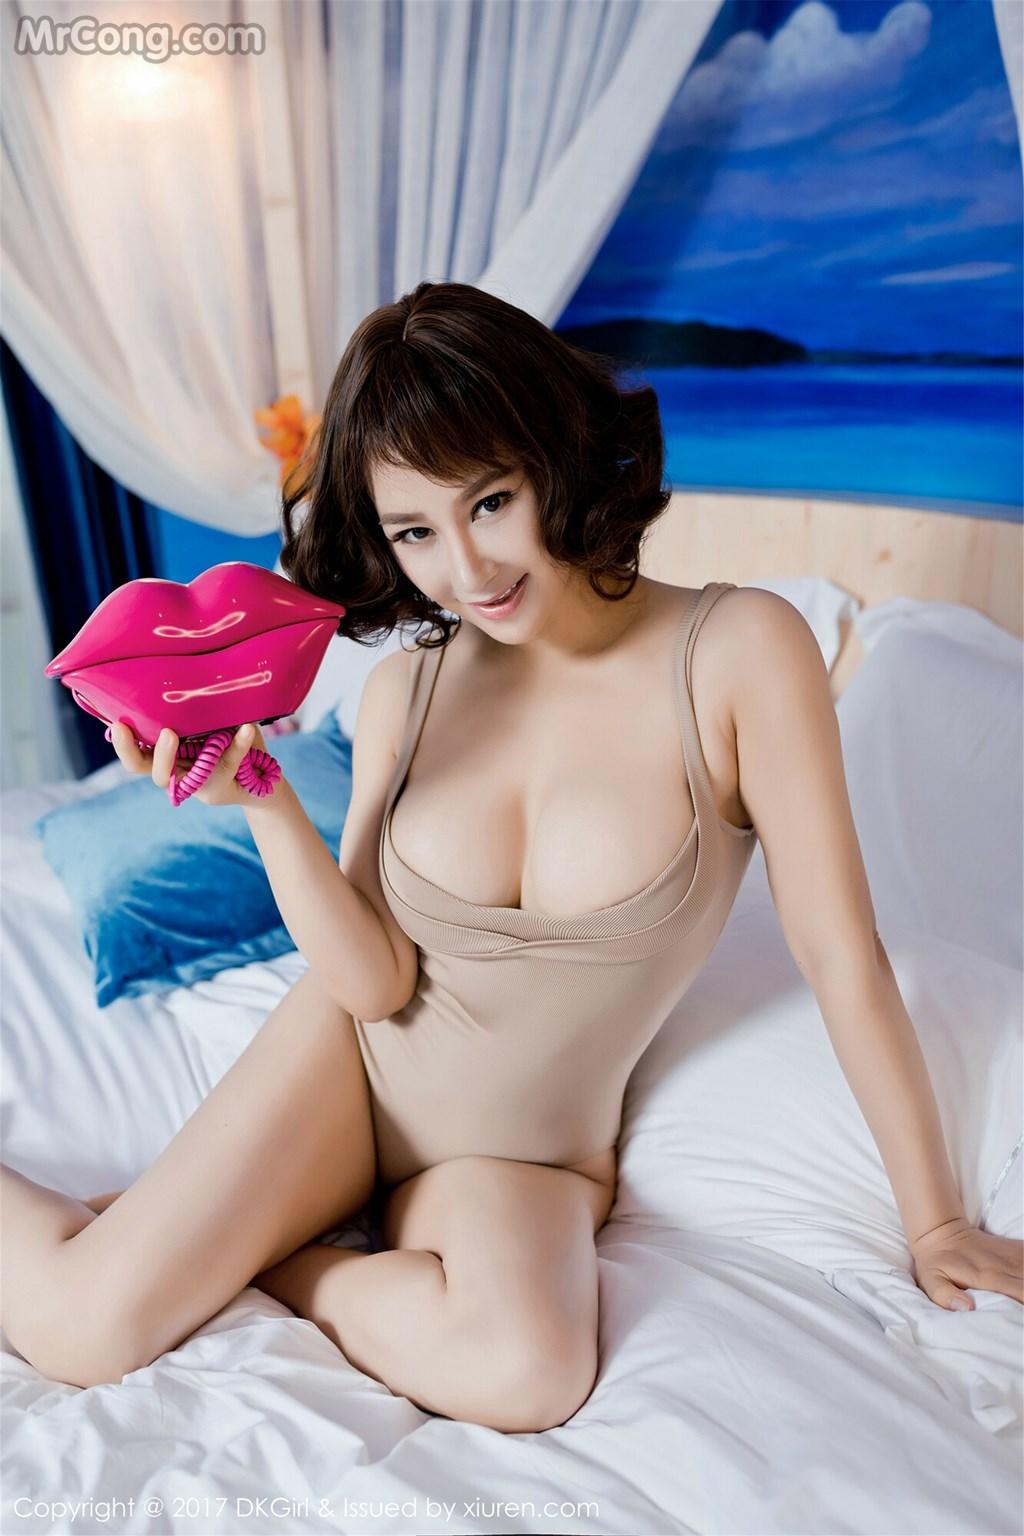 DKGirl Vol.021: Model Anna Jin (安娜 金) (56 photos)